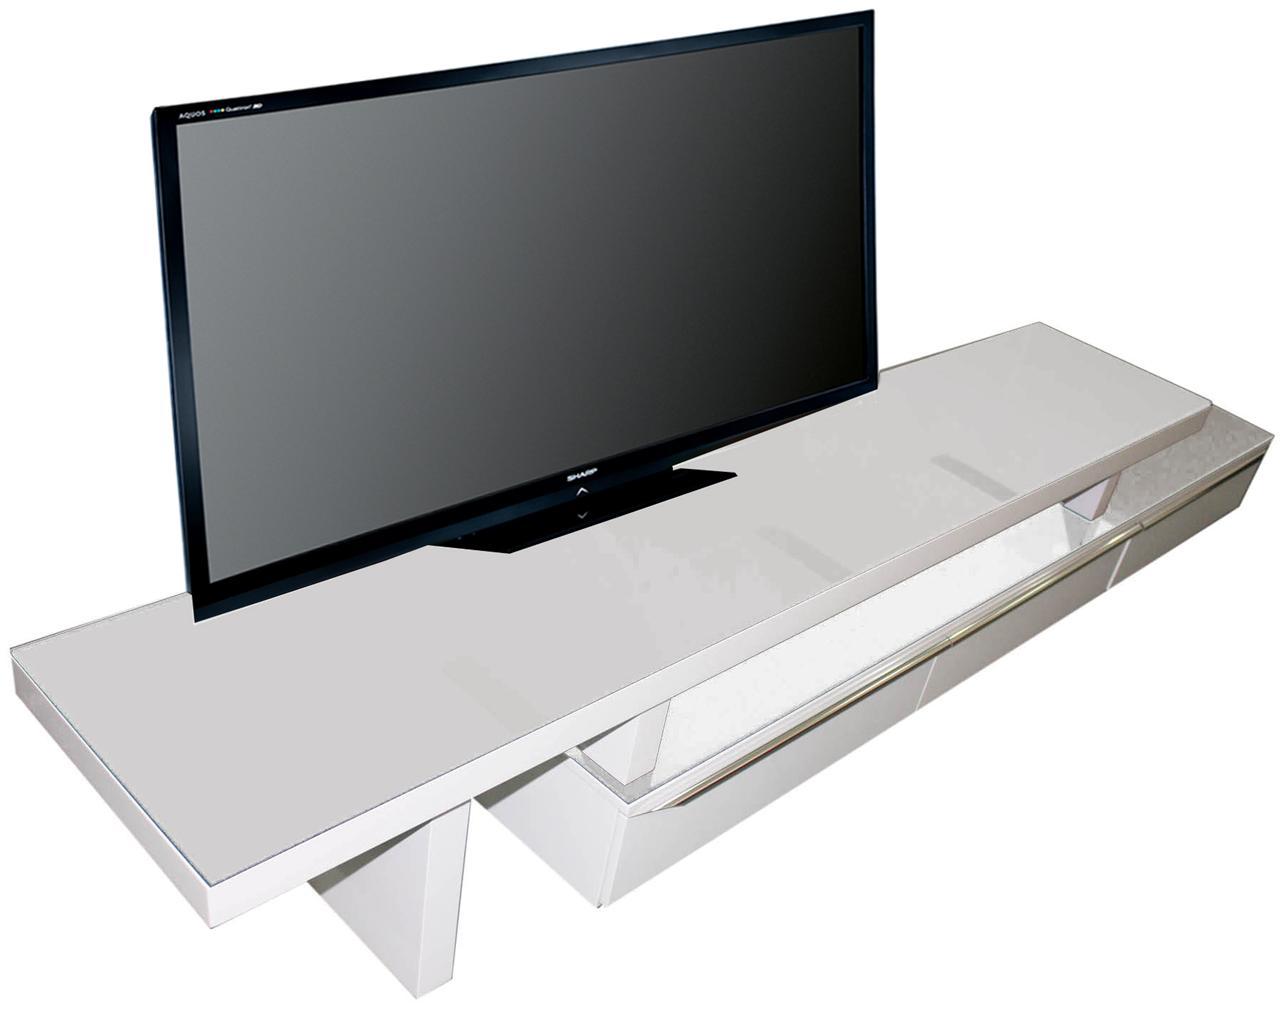 cappuccino wohnzimmer:Cheap TV Stands ~ cappuccino wohnzimmer